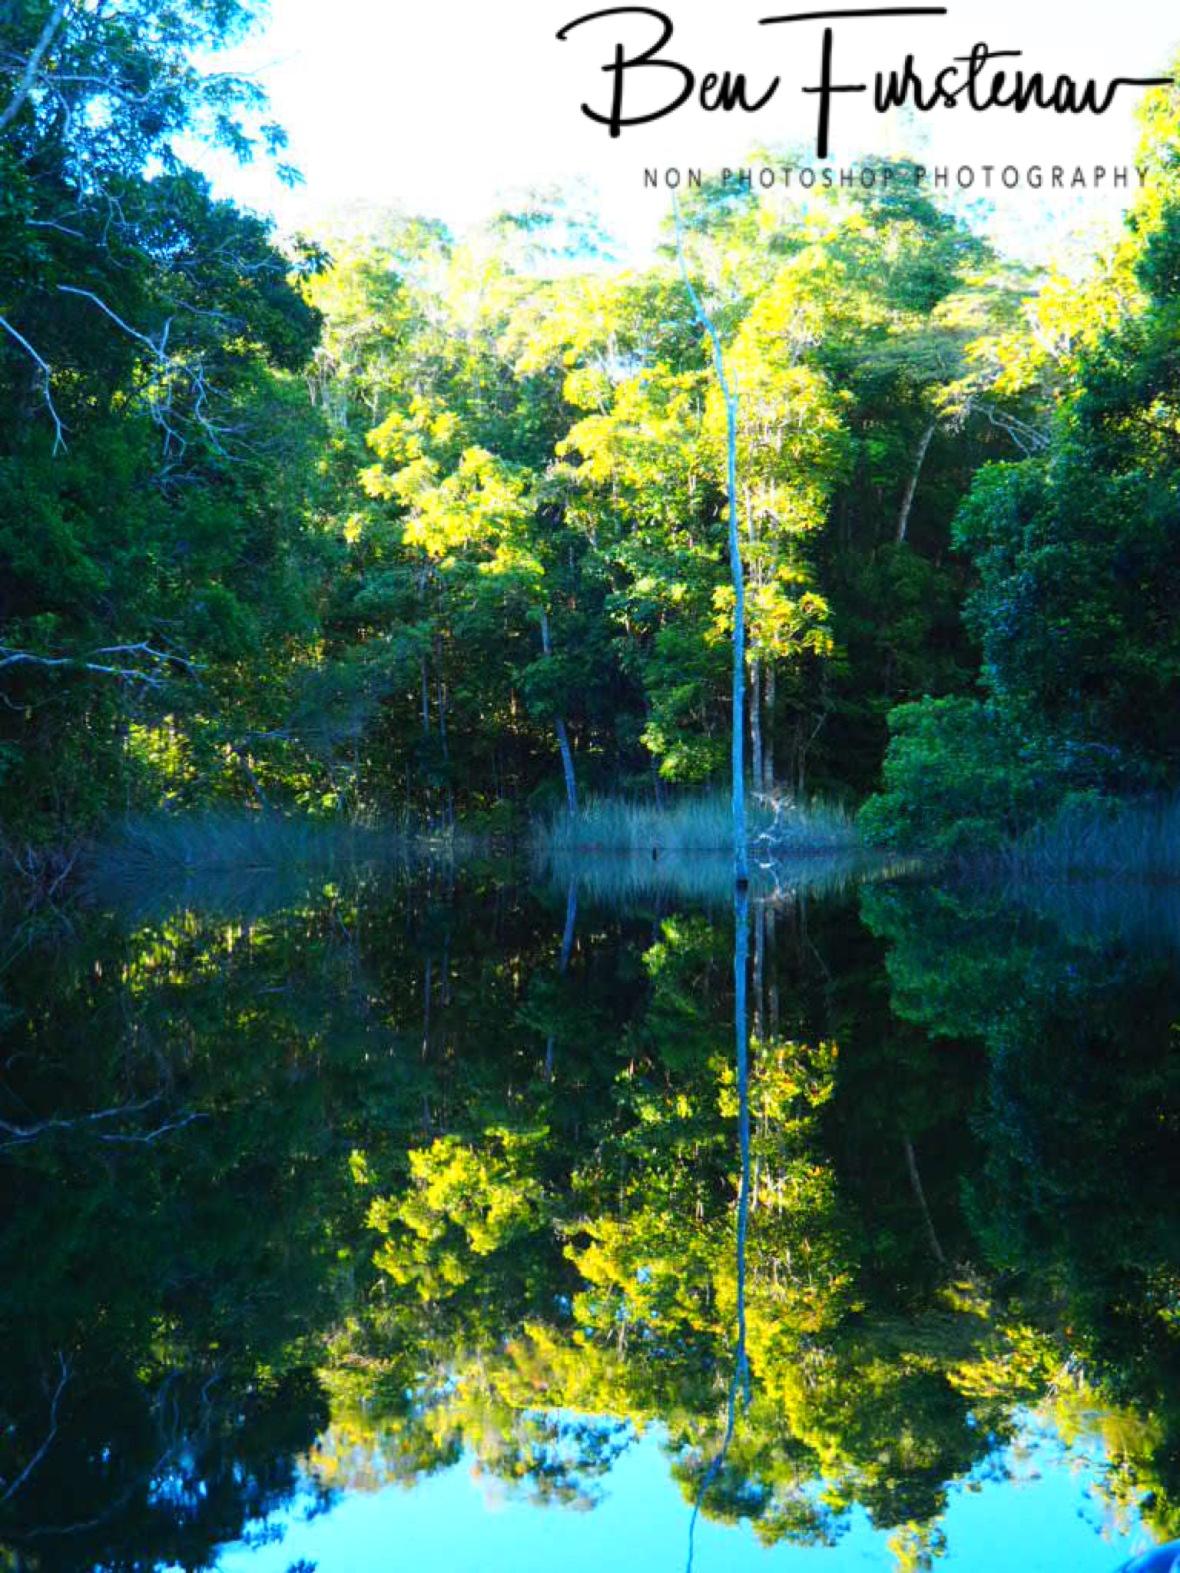 Tree reflections on Lake Paluma, Northern Queensland, Australia